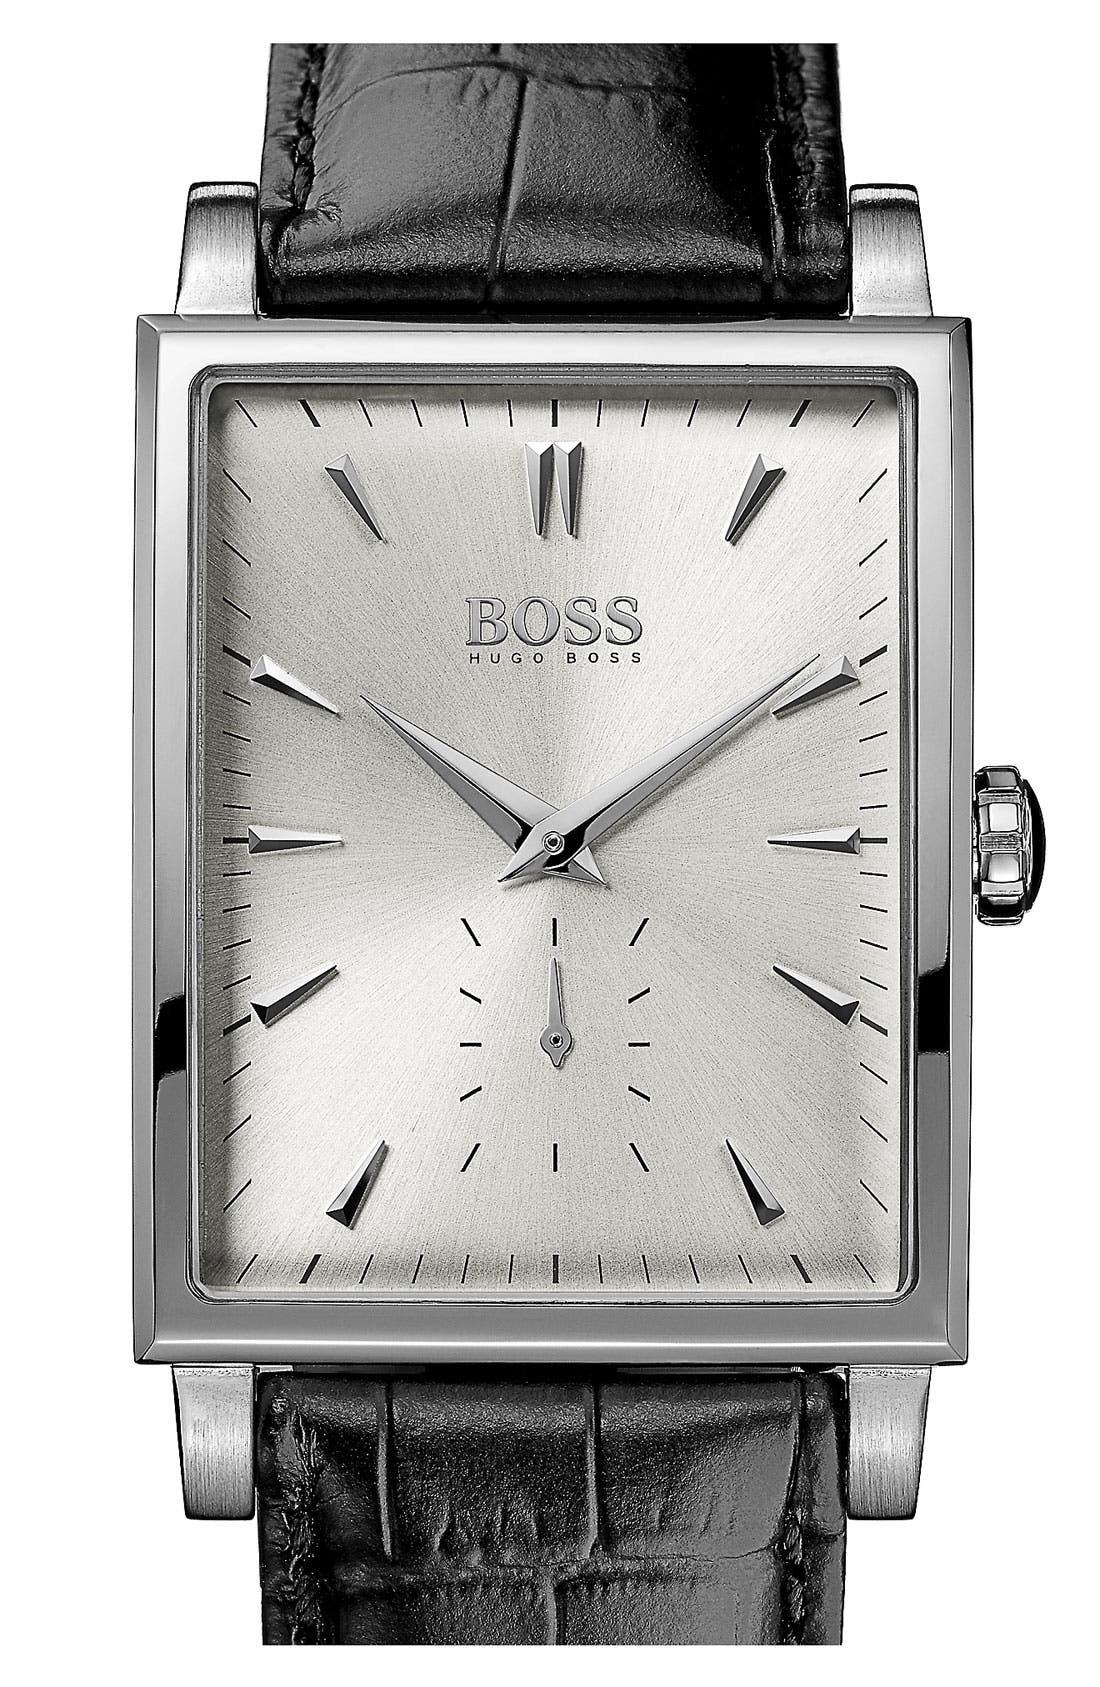 Alternate Image 1 Selected - BOSS HUGO BOSS Rectangular Leather Strap Watch, 31mm x 39mm